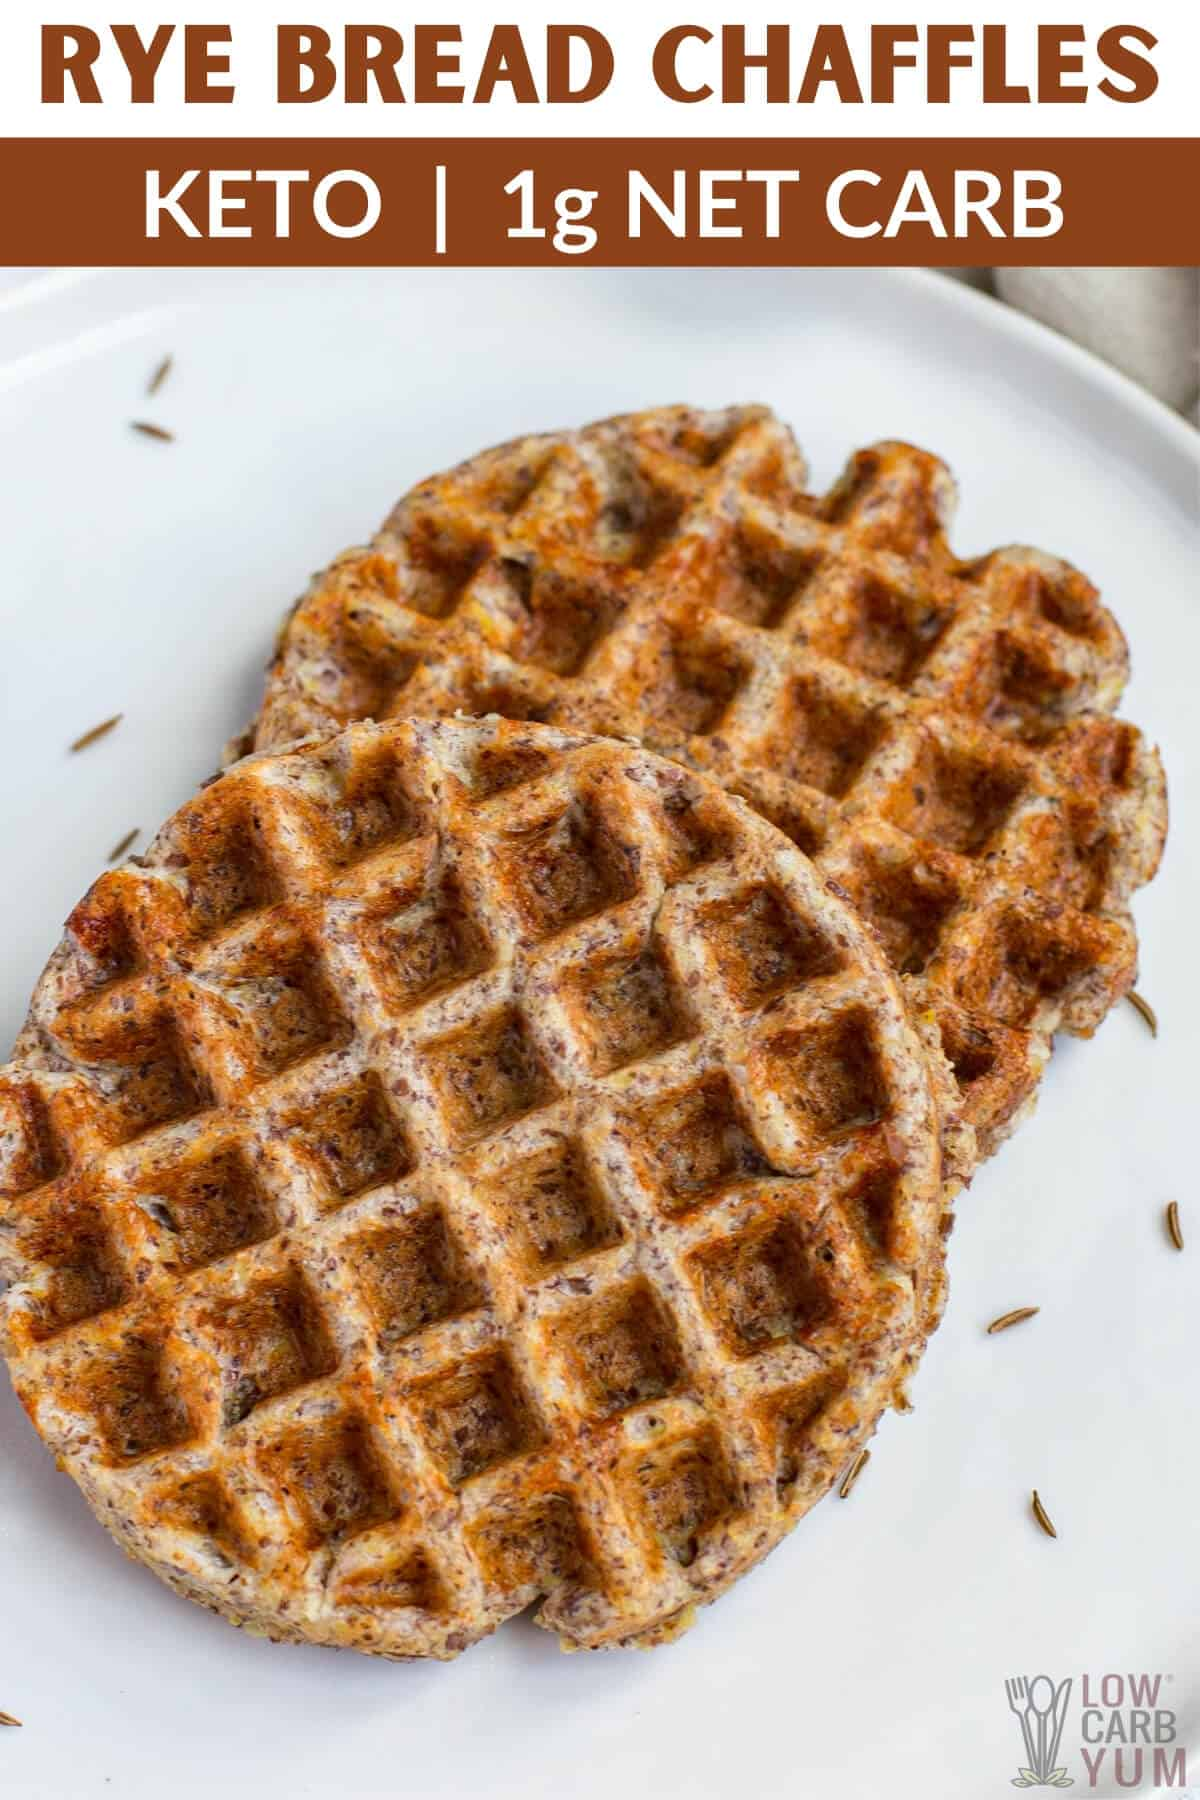 rye bread chaffles recipe